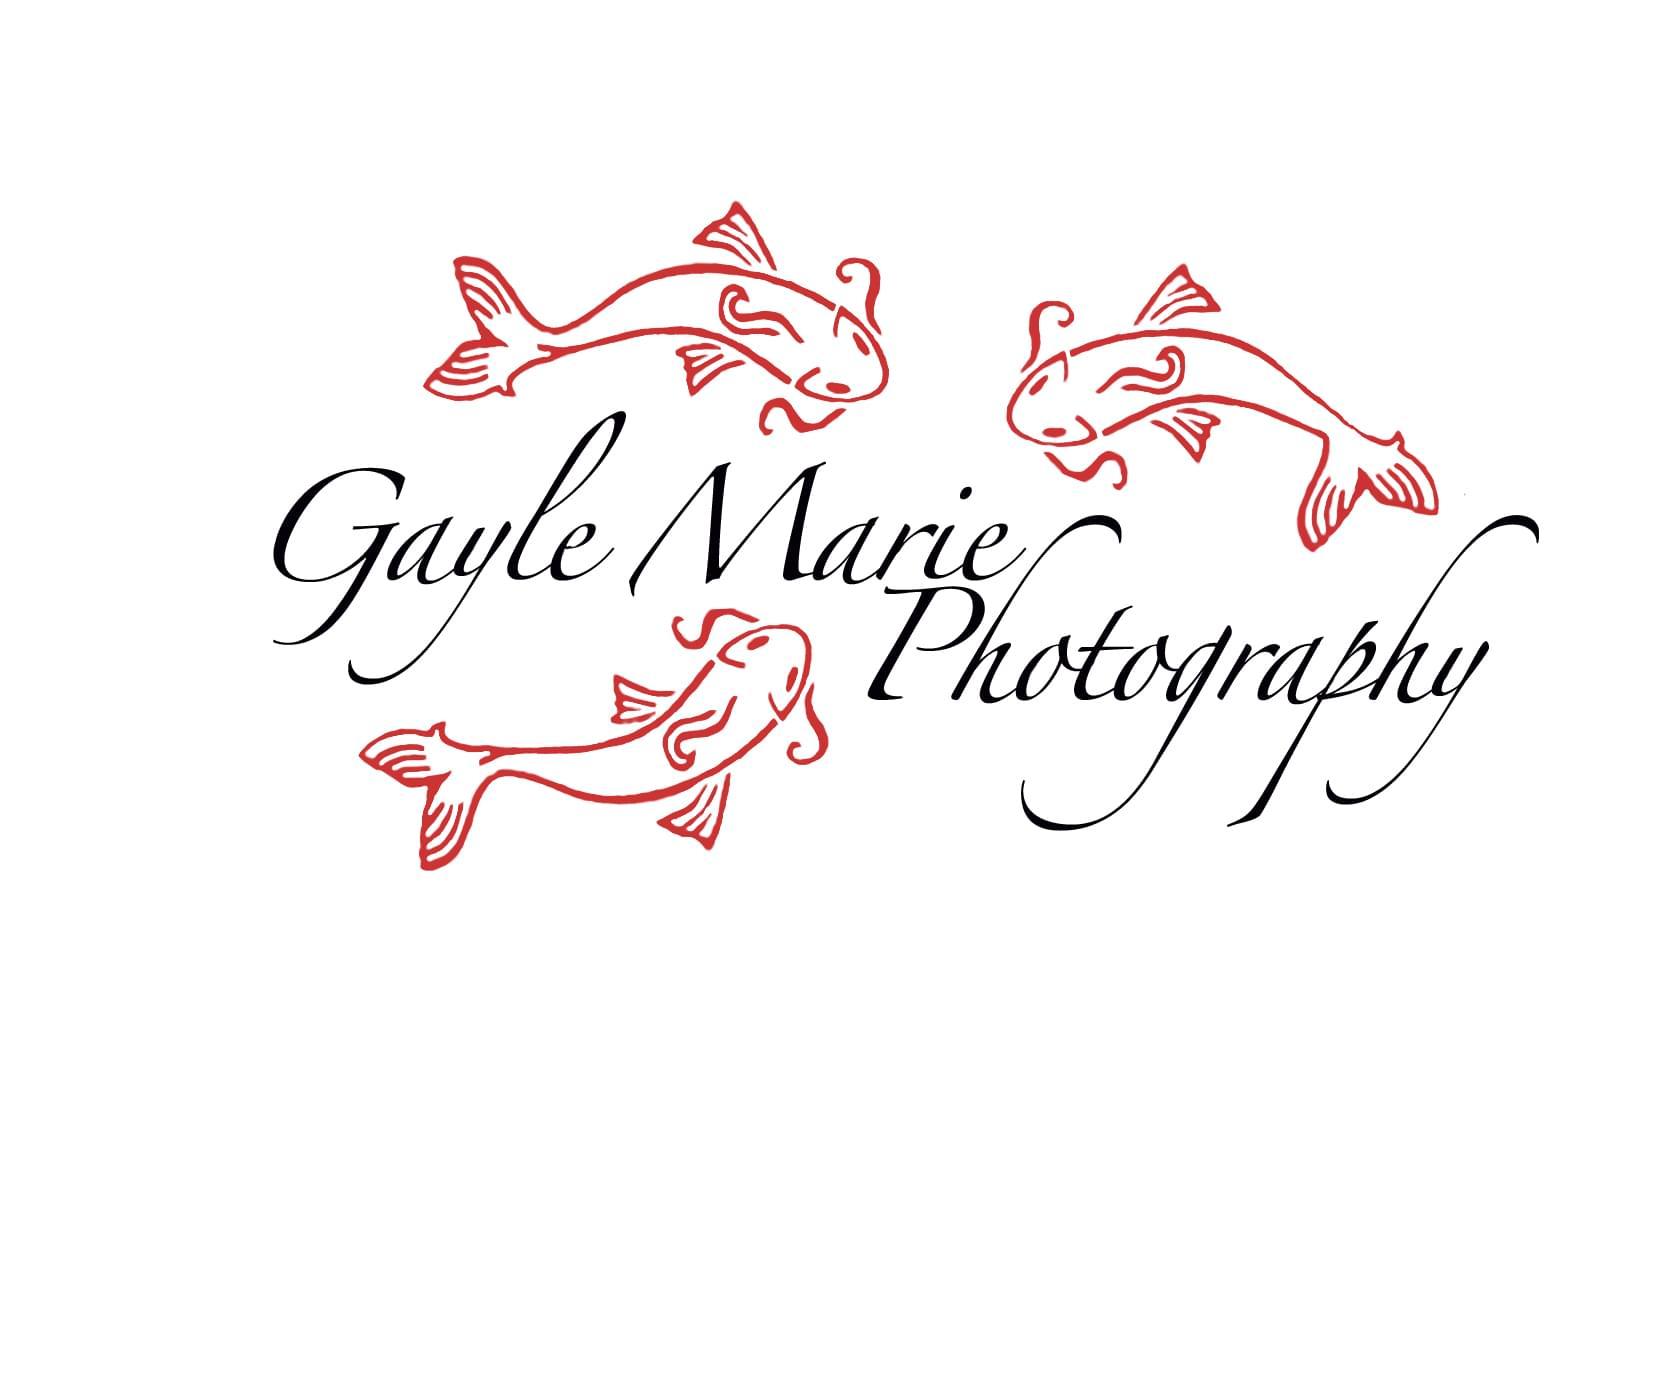 Gaylemarie Logo